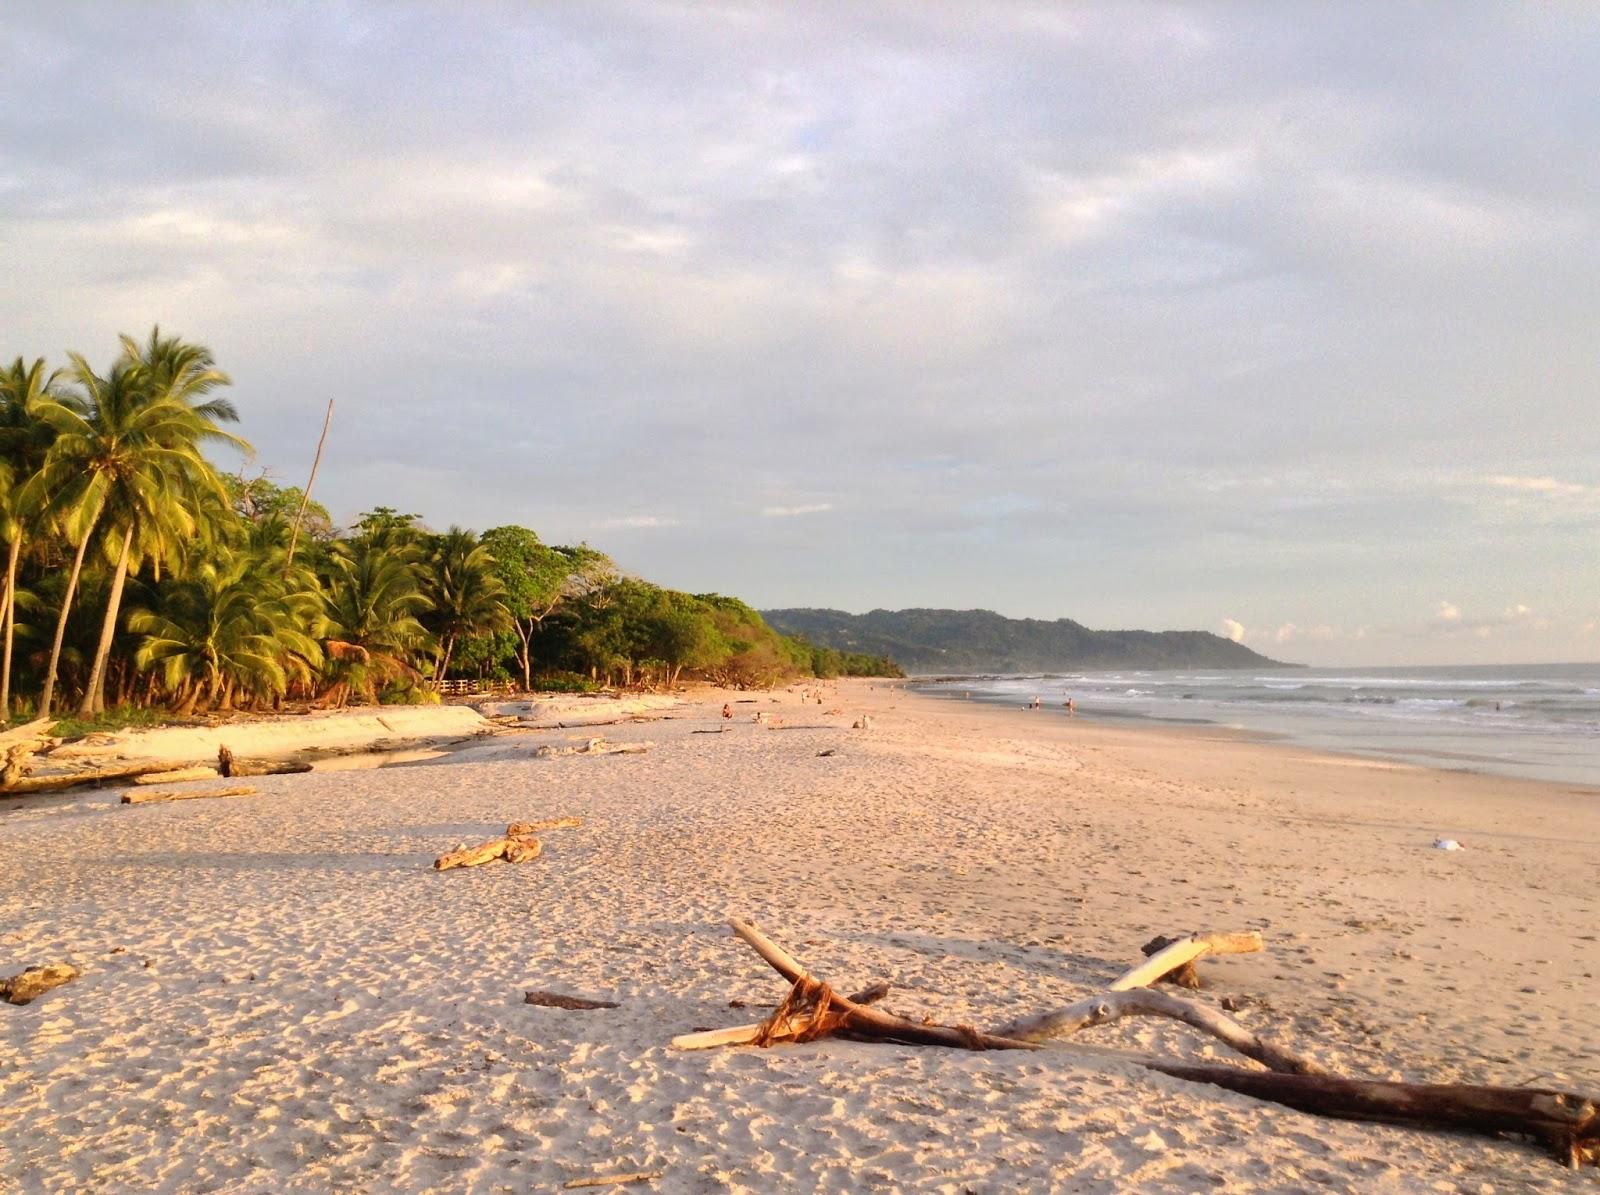 Playa de Santa Teresa, Península de Nicoya, Costa Rica.